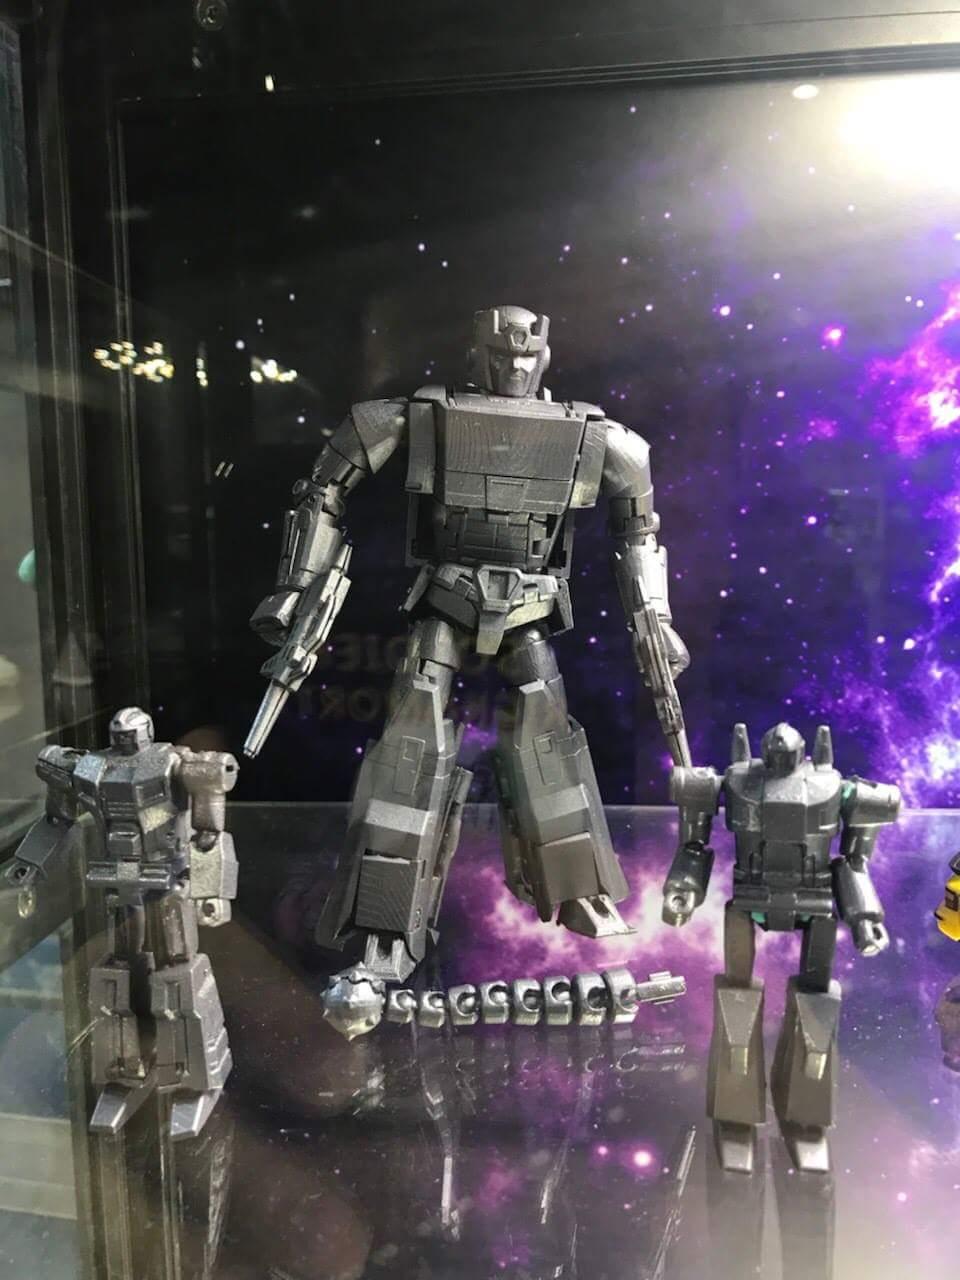 [X-Transbots] Produit Tiers - Jouets MX-?? Locke - aka Kup/Kaisso HuhflzRD_o